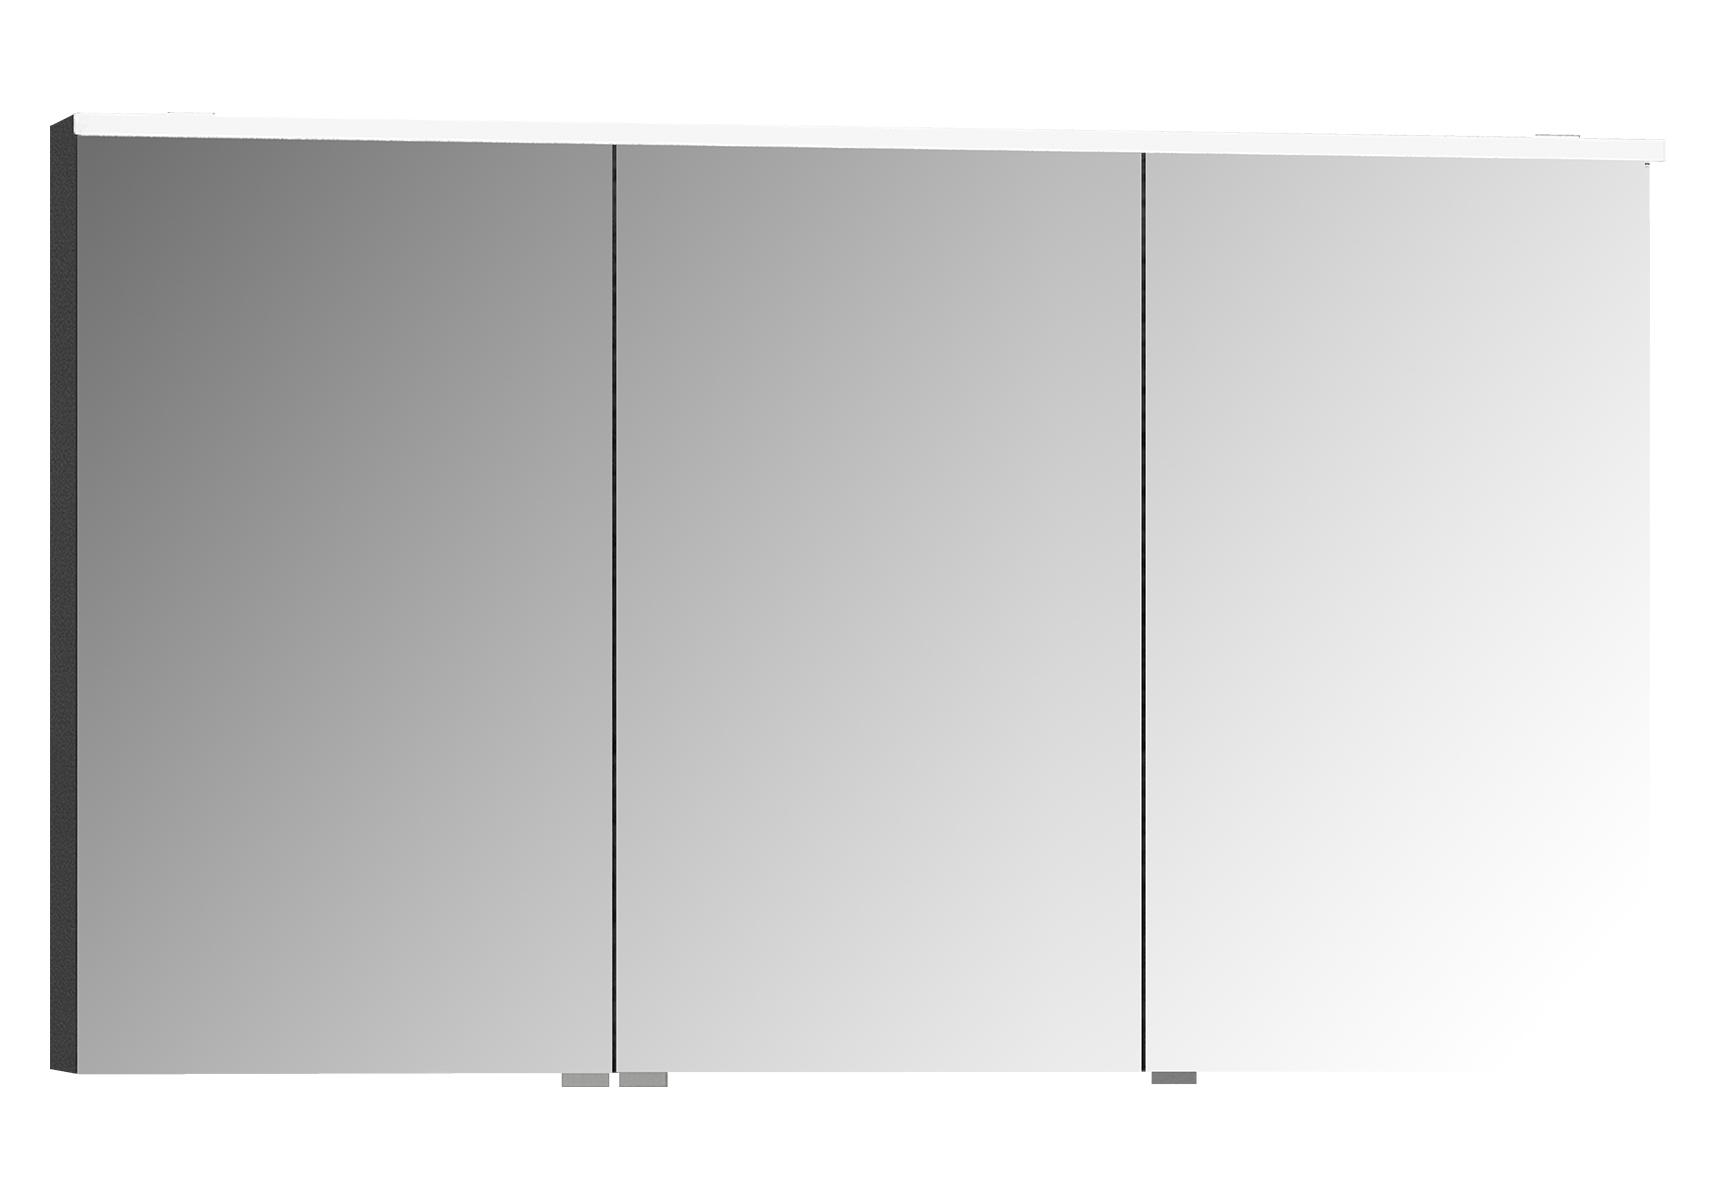 Integra Premium armoire de toilette, 120 cm, éclairage LED horizontale,anthraciteacite haute brilliance, 3 portes